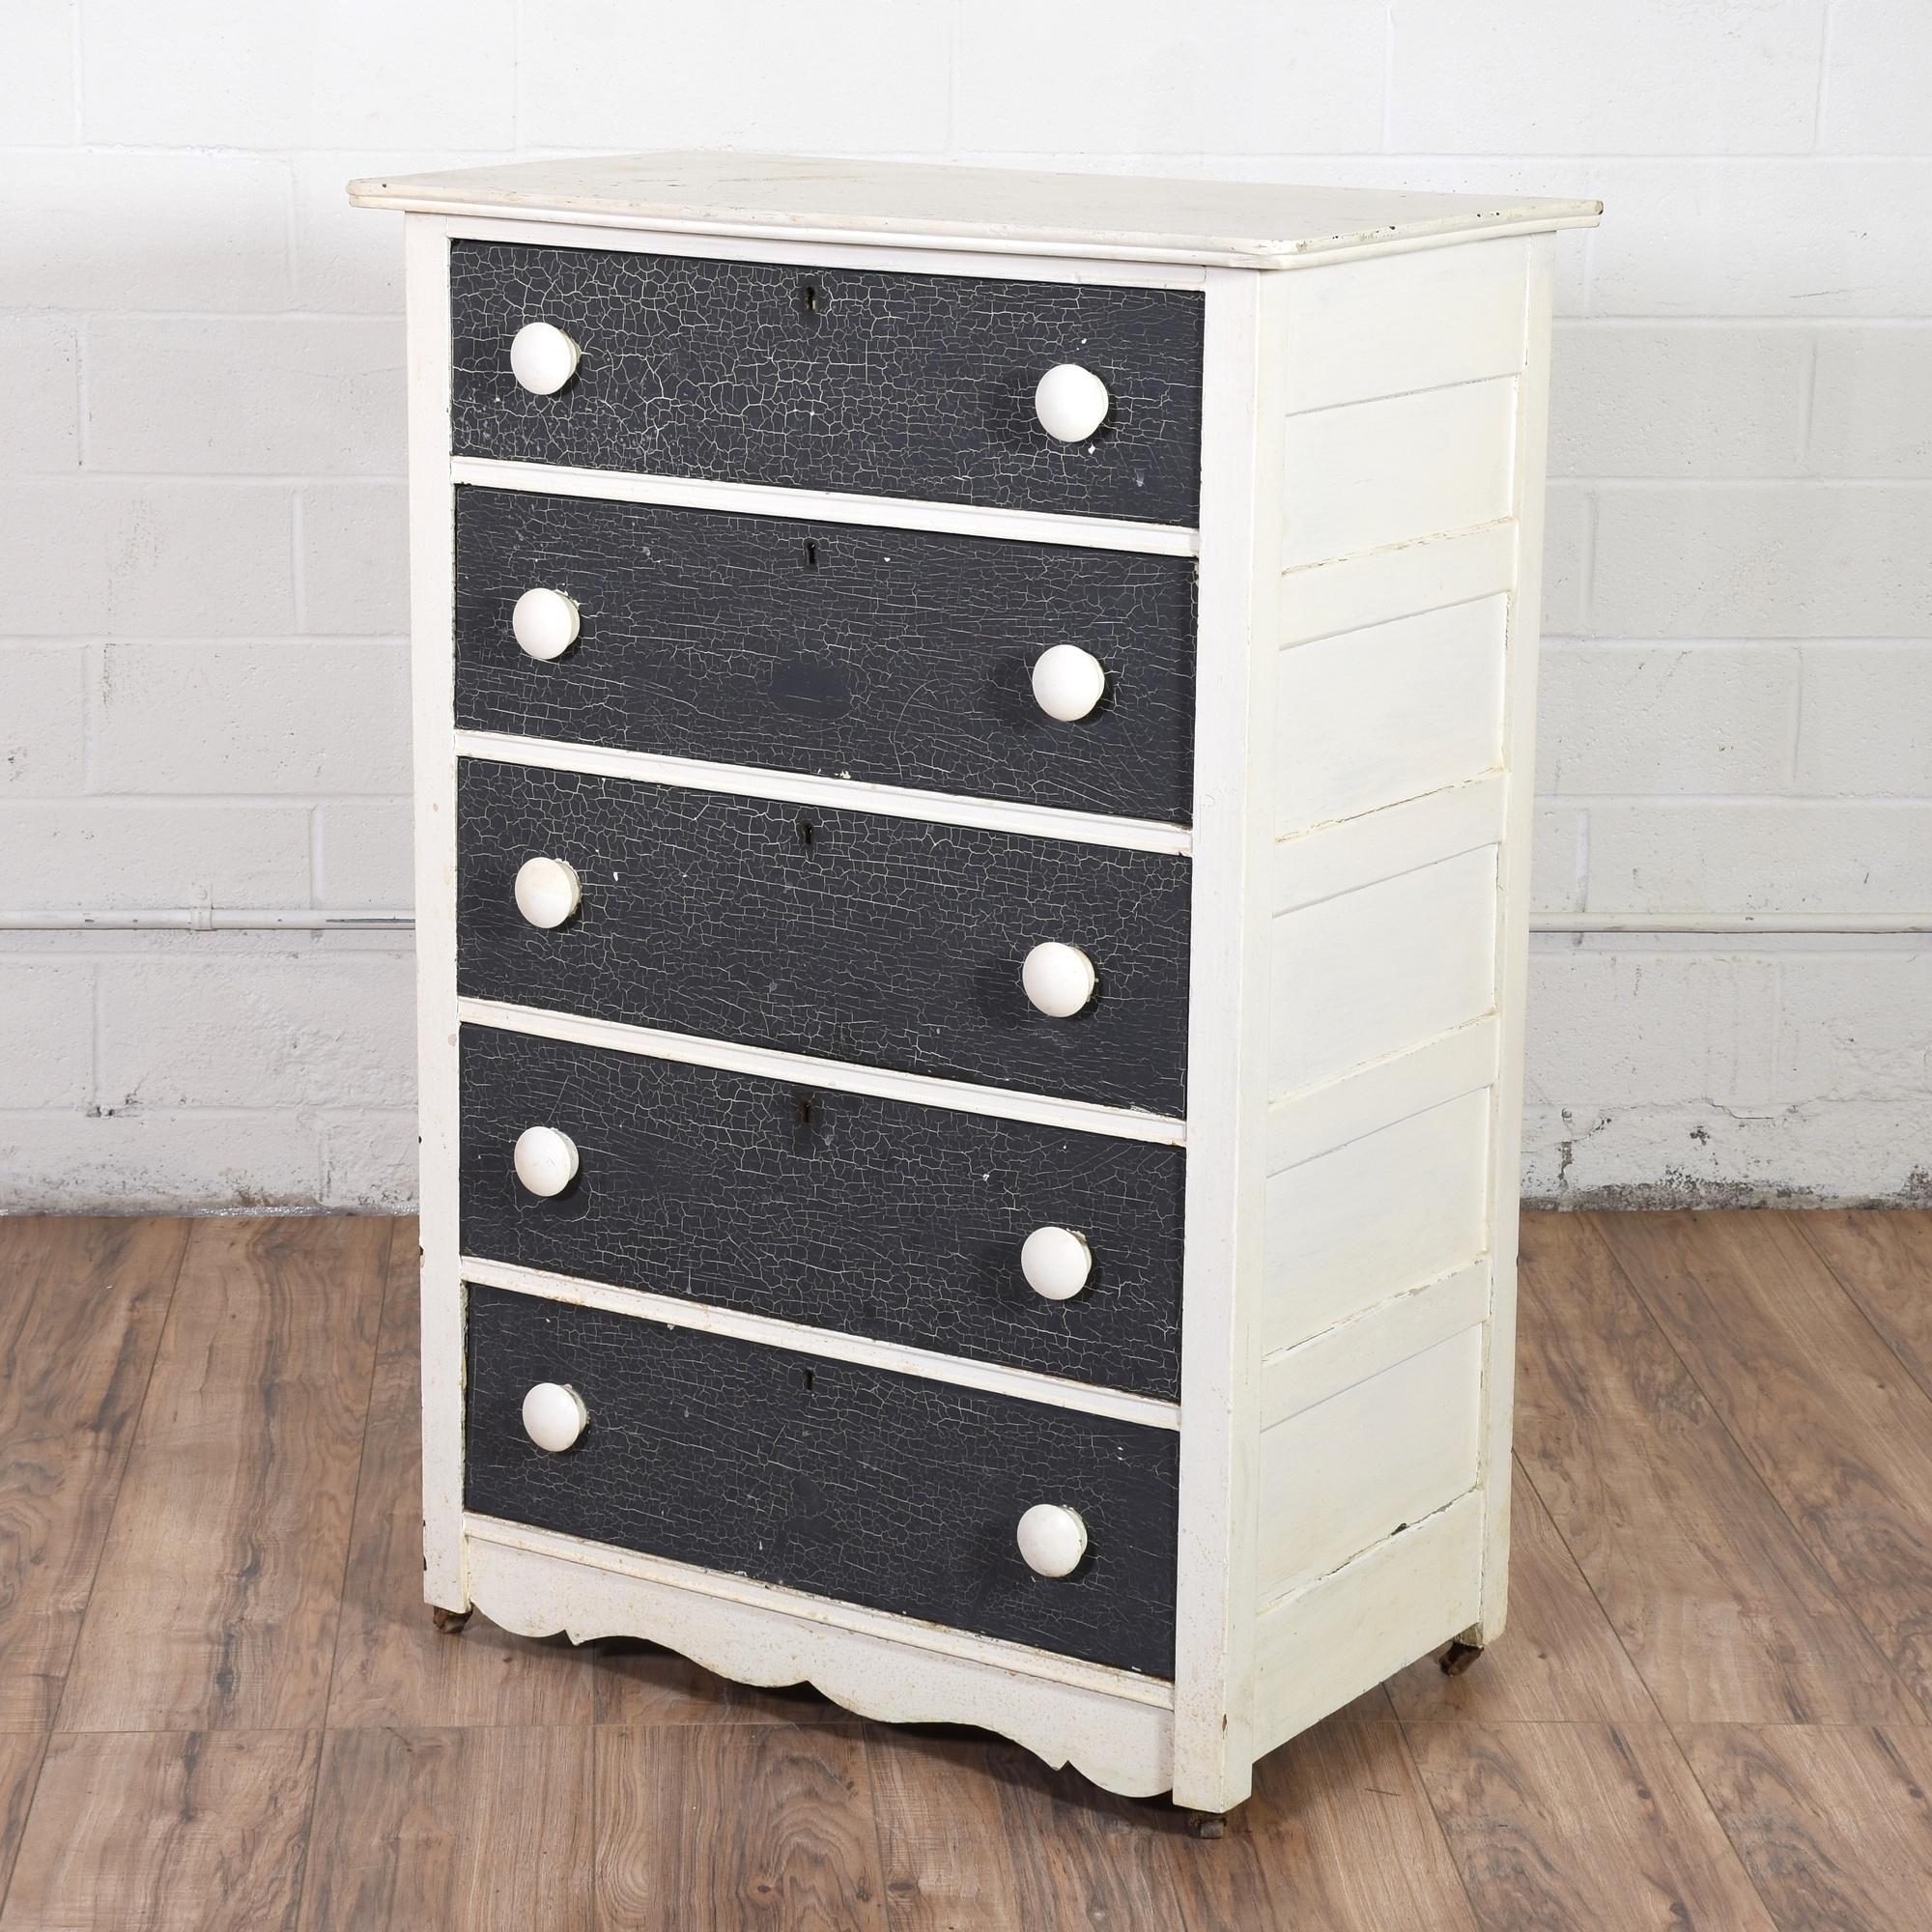 Shabby Chic Navy and White Dresser | Loveseat Vintage Furniture San Diego & Los Angeles